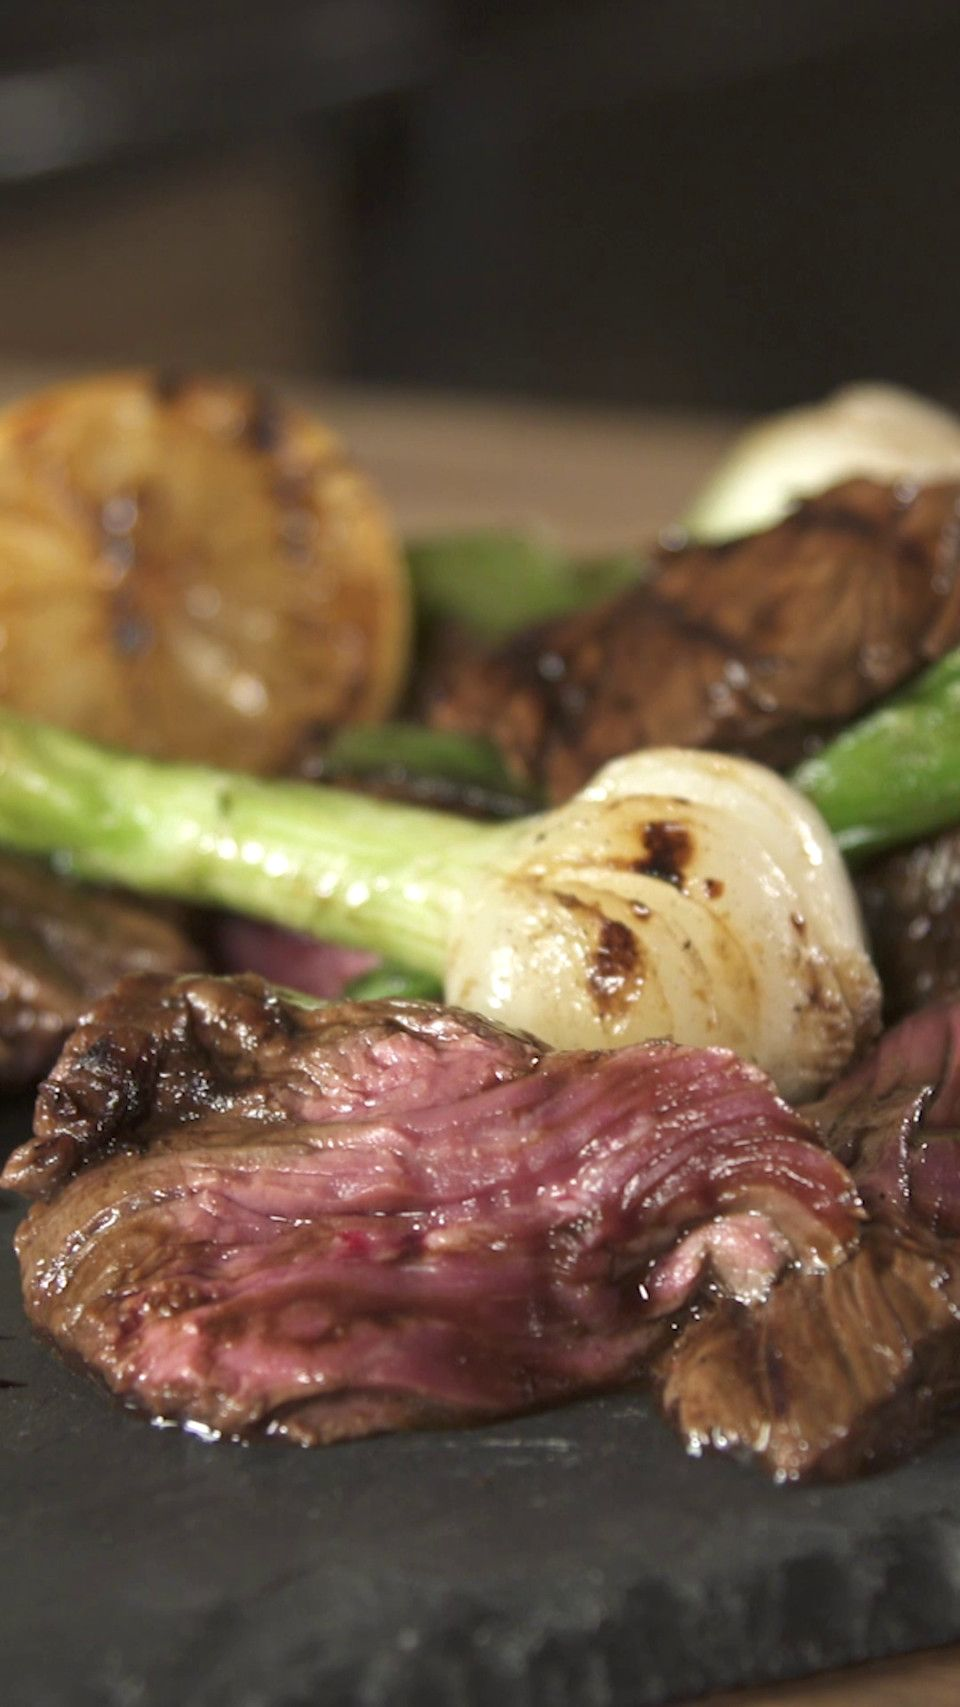 Recipe with video instructions: This juicy recipe of Hanger Steak will impress everyone.  Ingredients: 2-8 oz cut of cleaned hanger steak, 1 oz molasses, 1 oz sherry vinegar, 1 Tbsp smoked sea salt, 2 Tbsp fresh black pepper, 2 lemons, halved, 8 green onions